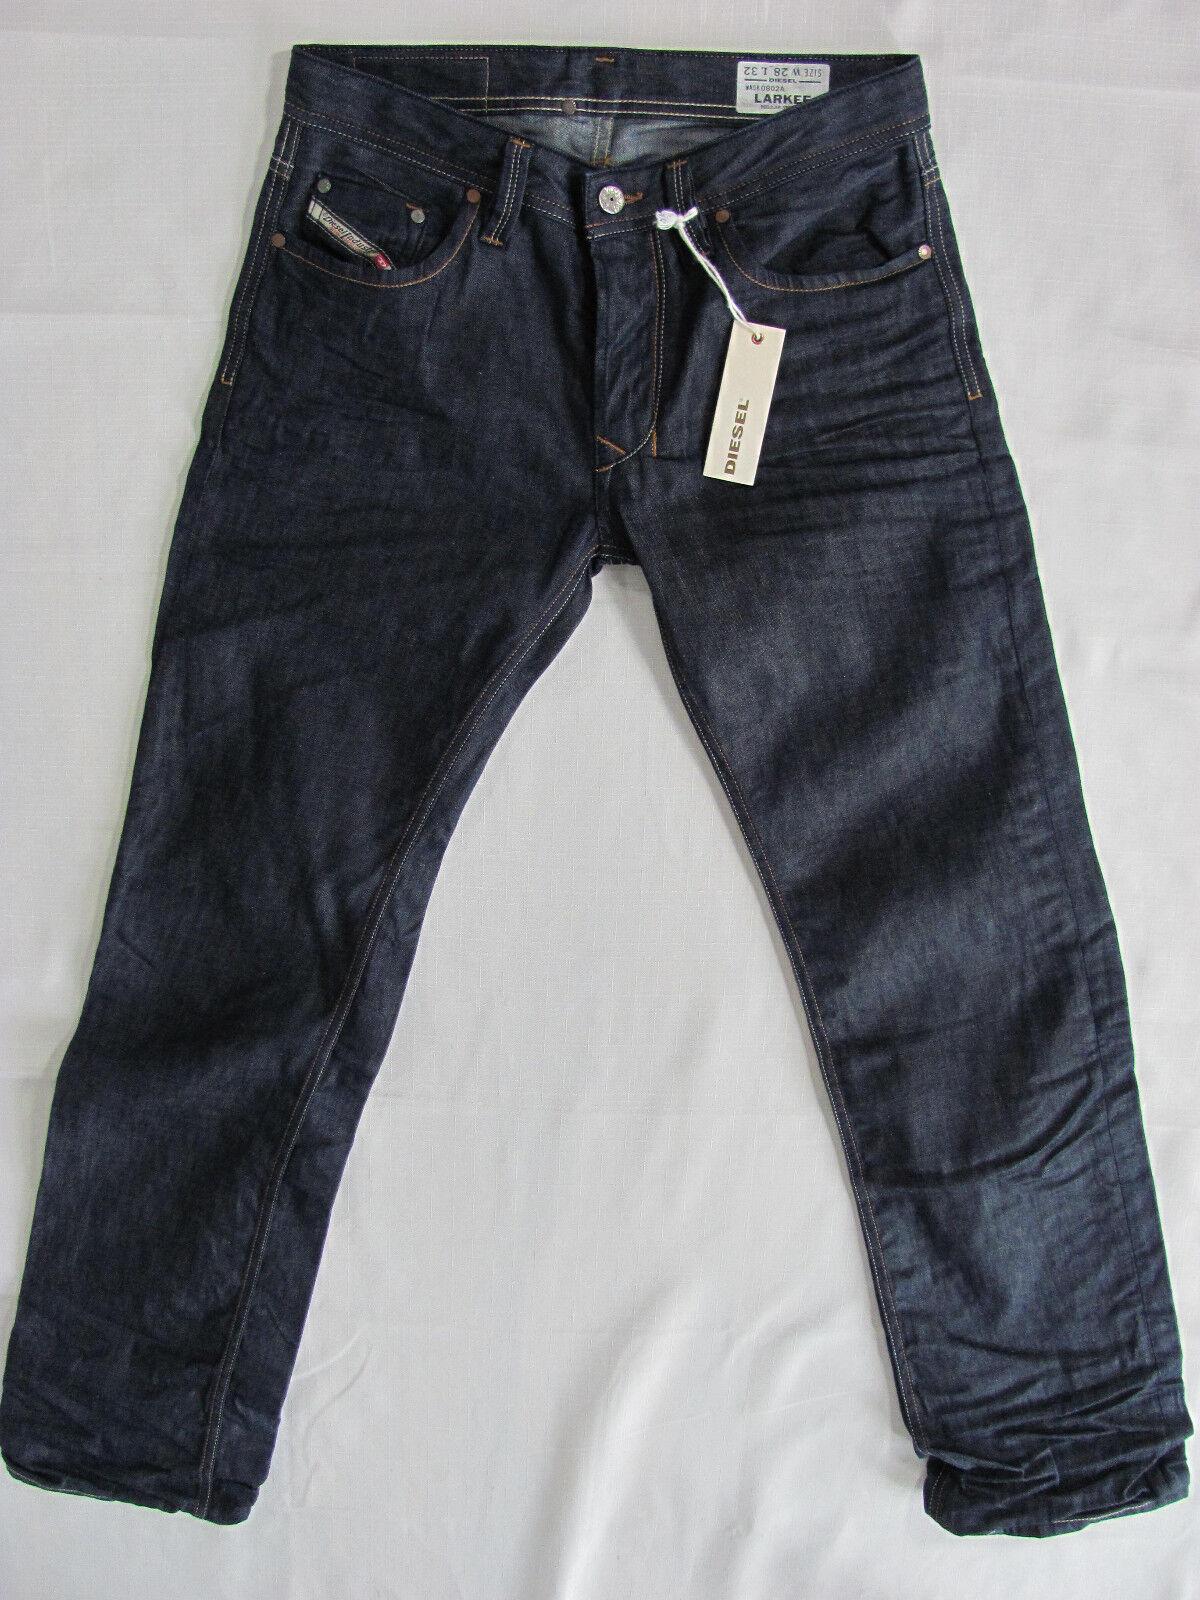 5b4c1eea Men's Diesel Larkee Regular Straight Jeans - Wash 0802a -size 28 for ...